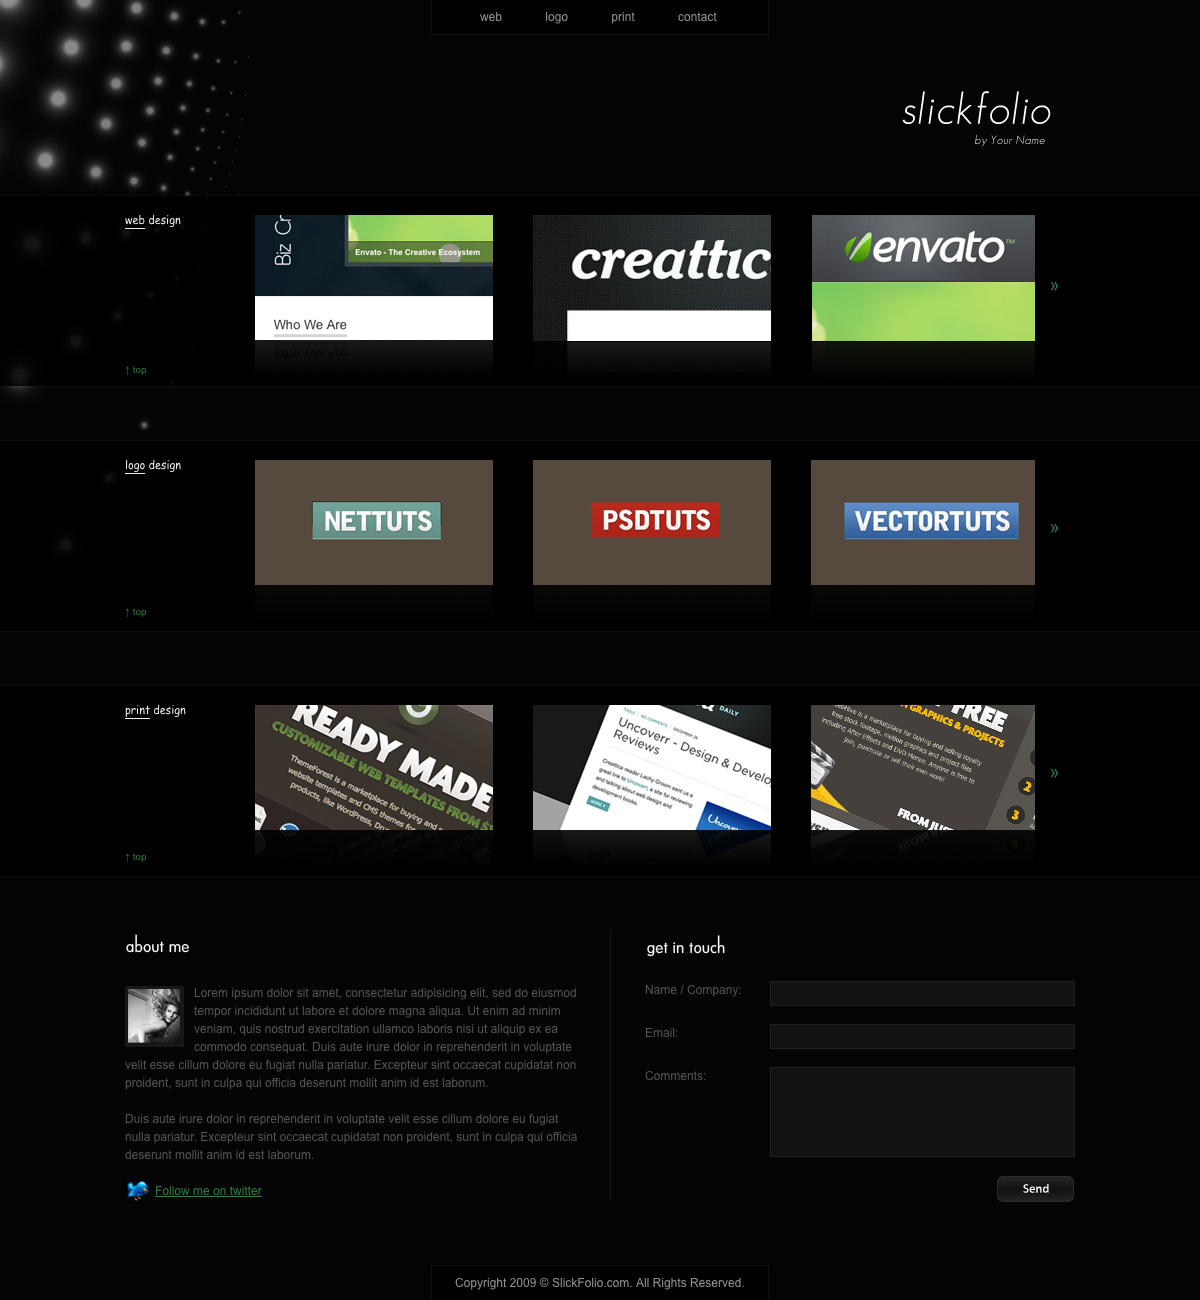 SlickFolio - Photographer / Web Designer Creative Portfolio - SlickFolio - One-page Creative Portfolio Theme.